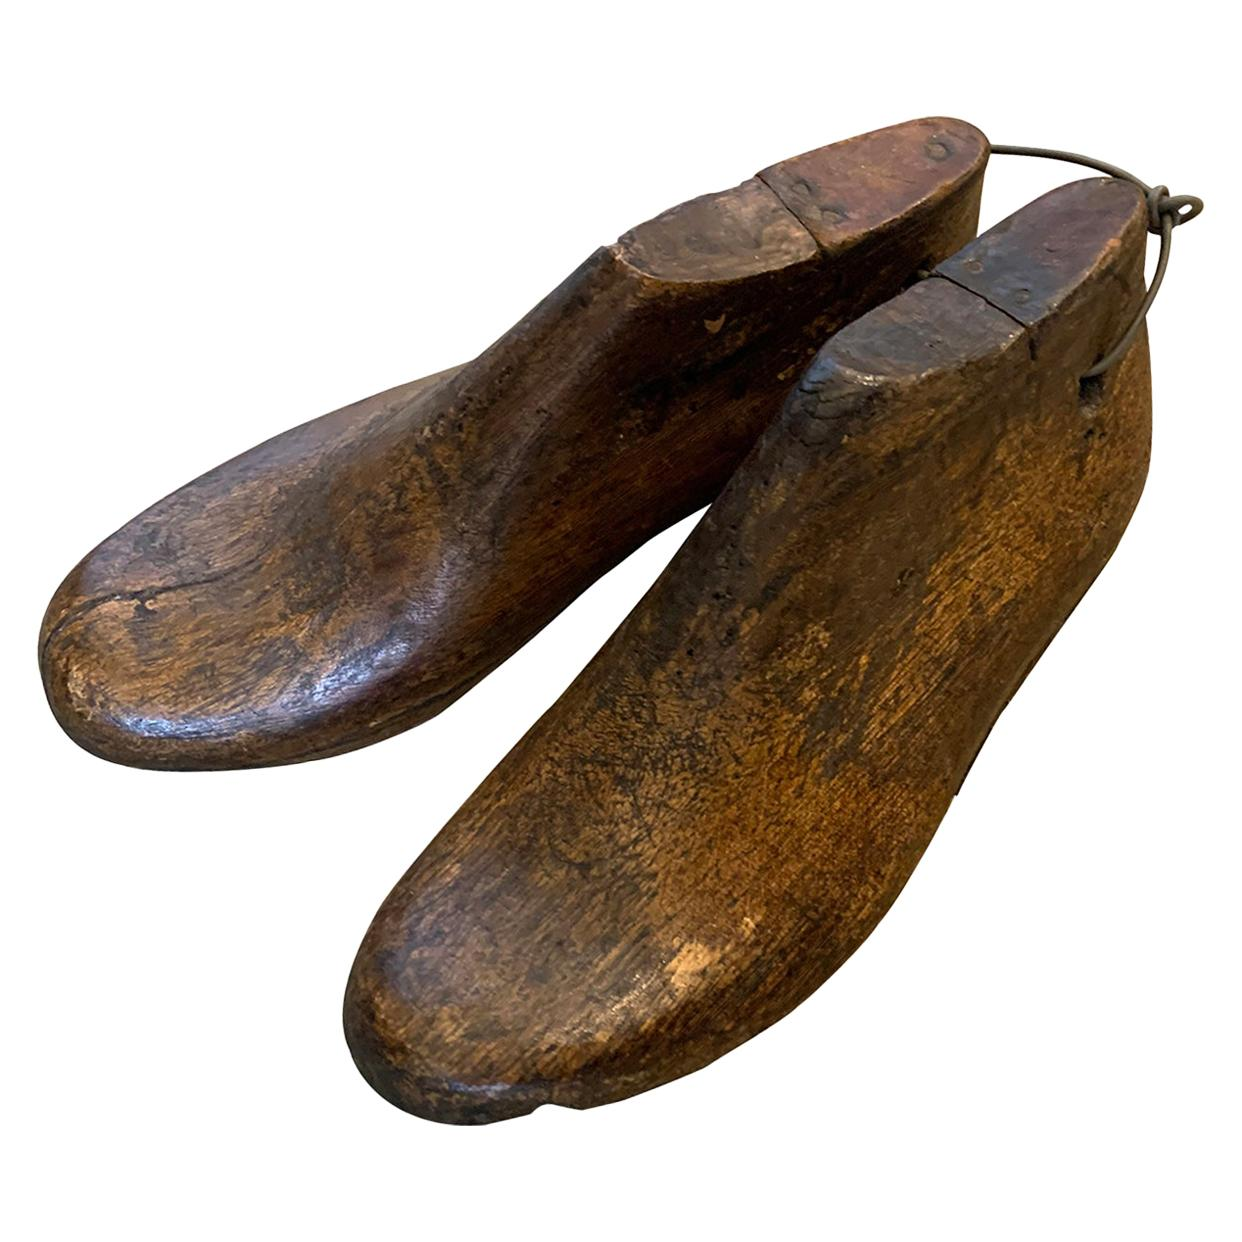 Pair of 20th Century Children's Wooden Shoe Molds